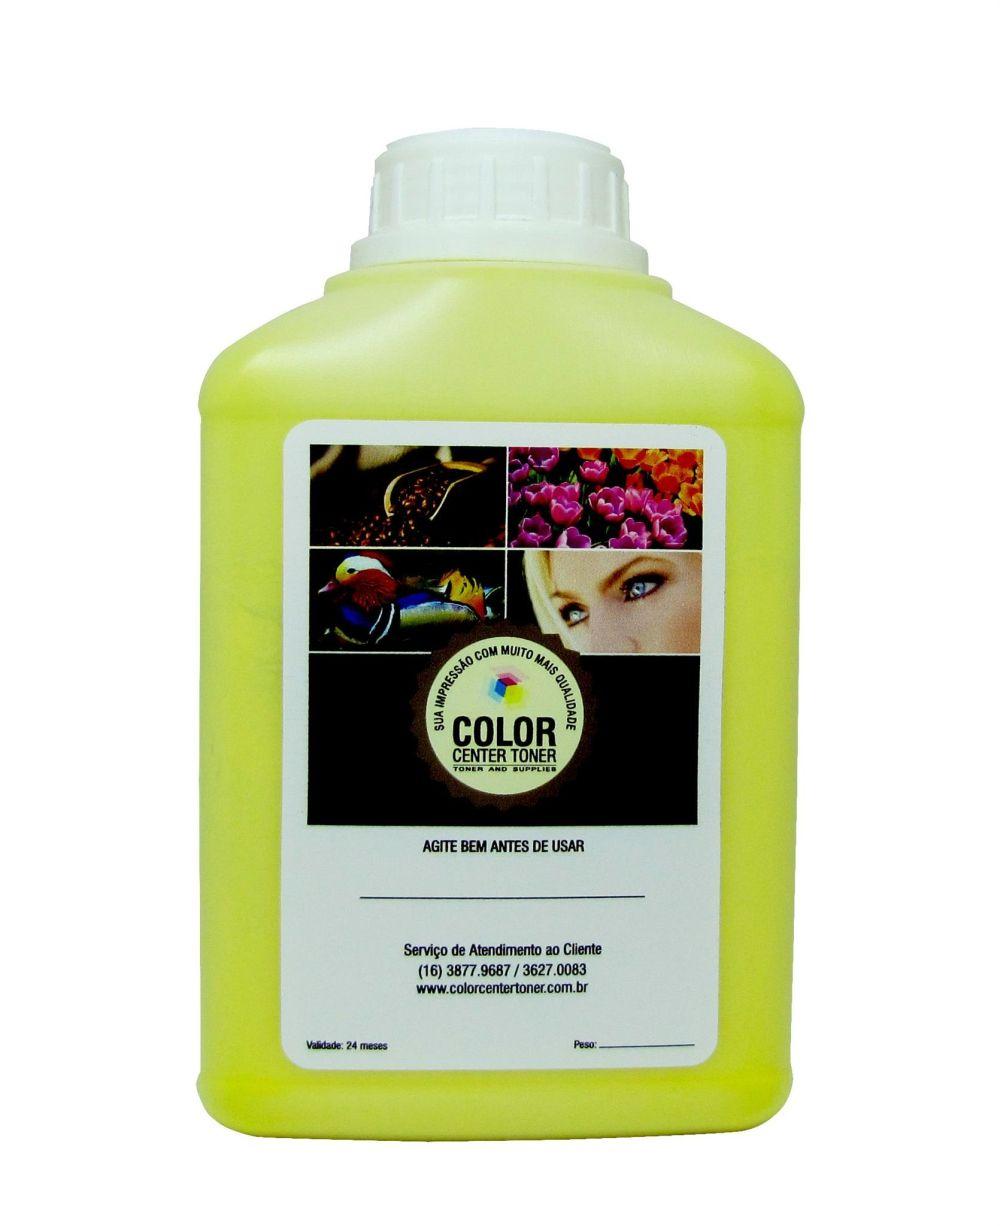 Refil de Toner Bizhub C250/252 Amarelo